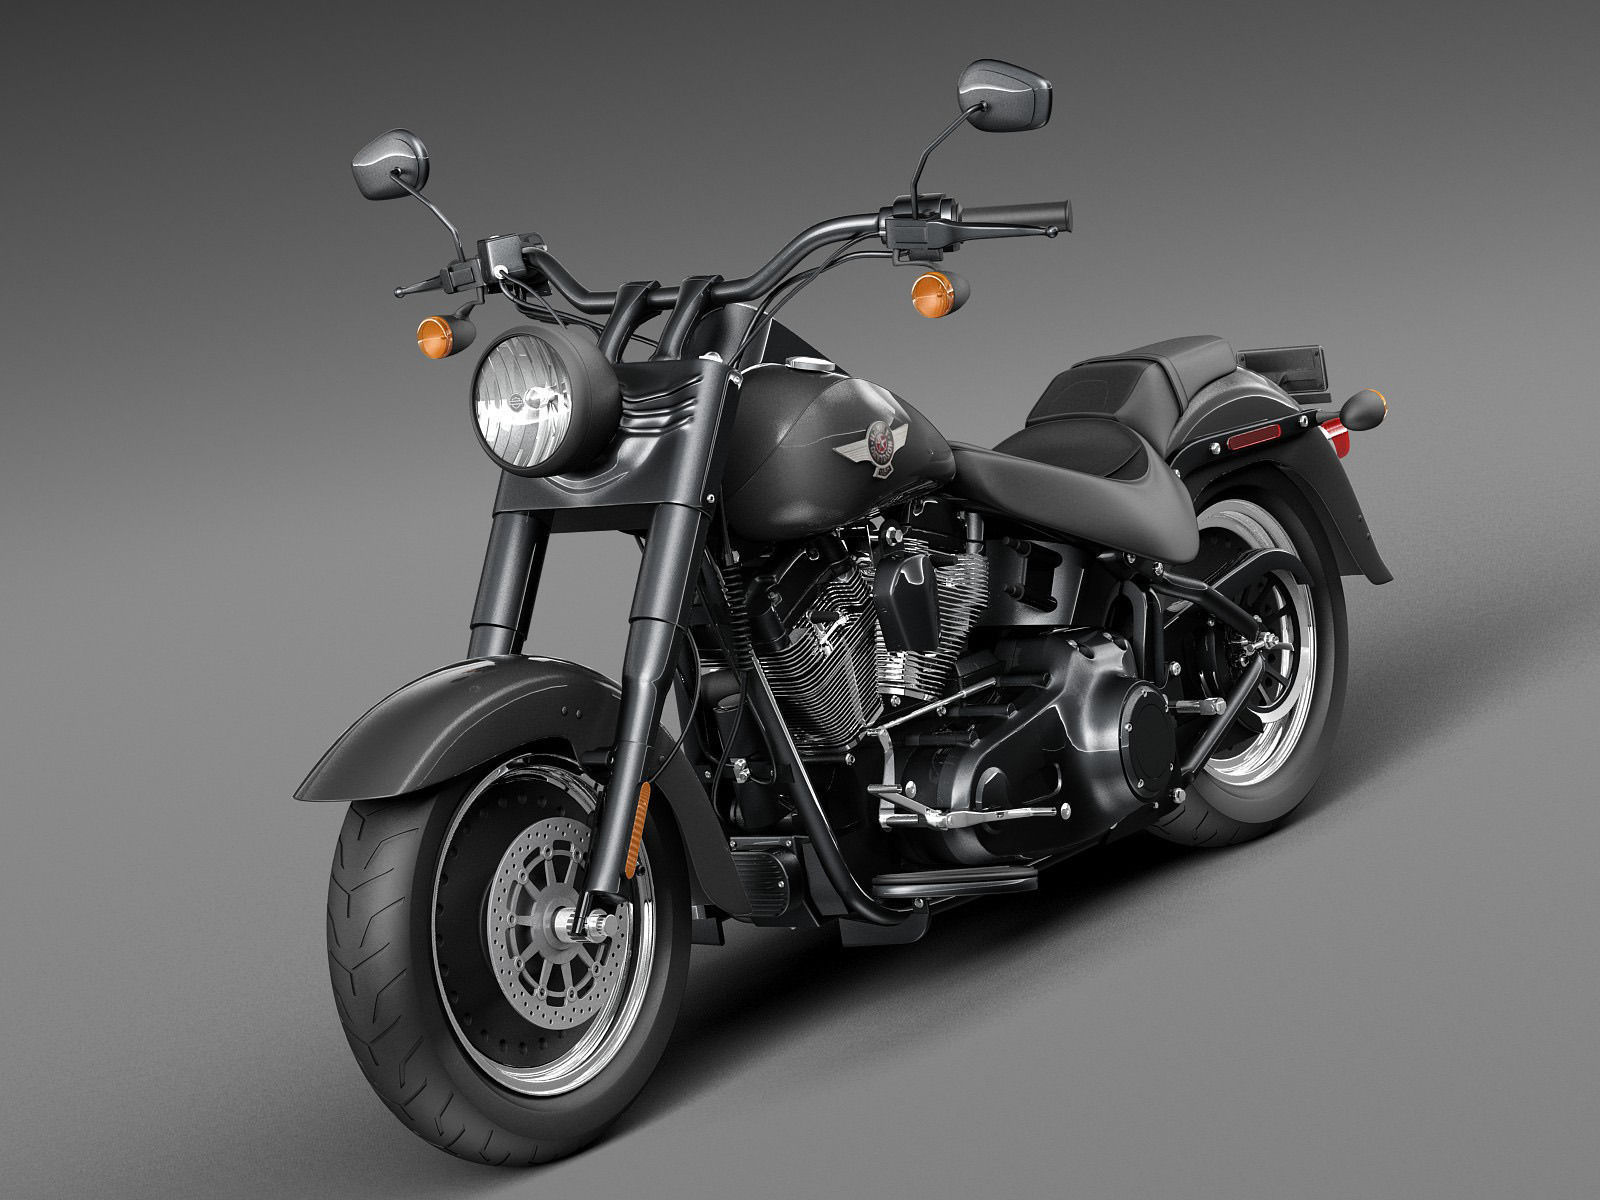 Harley Davidson Fatboy S Black Matt 2016